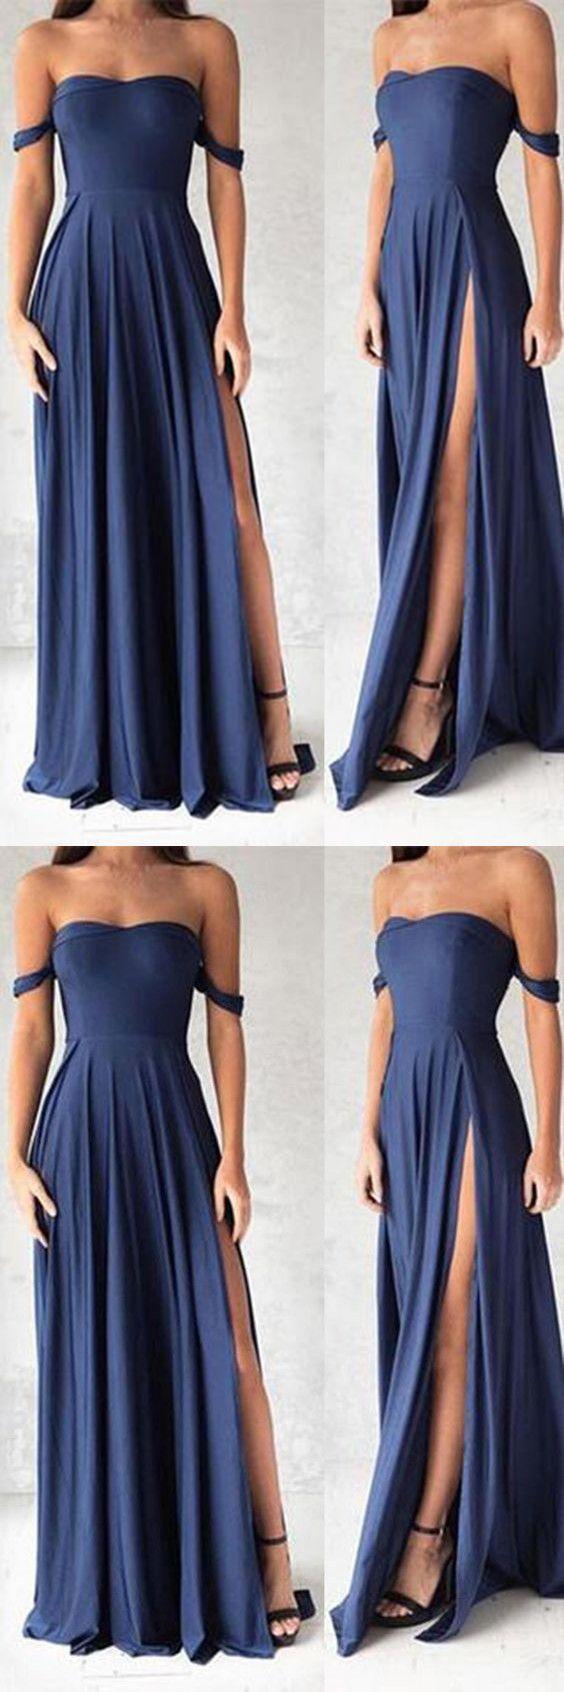 Blue dress elegant 4u